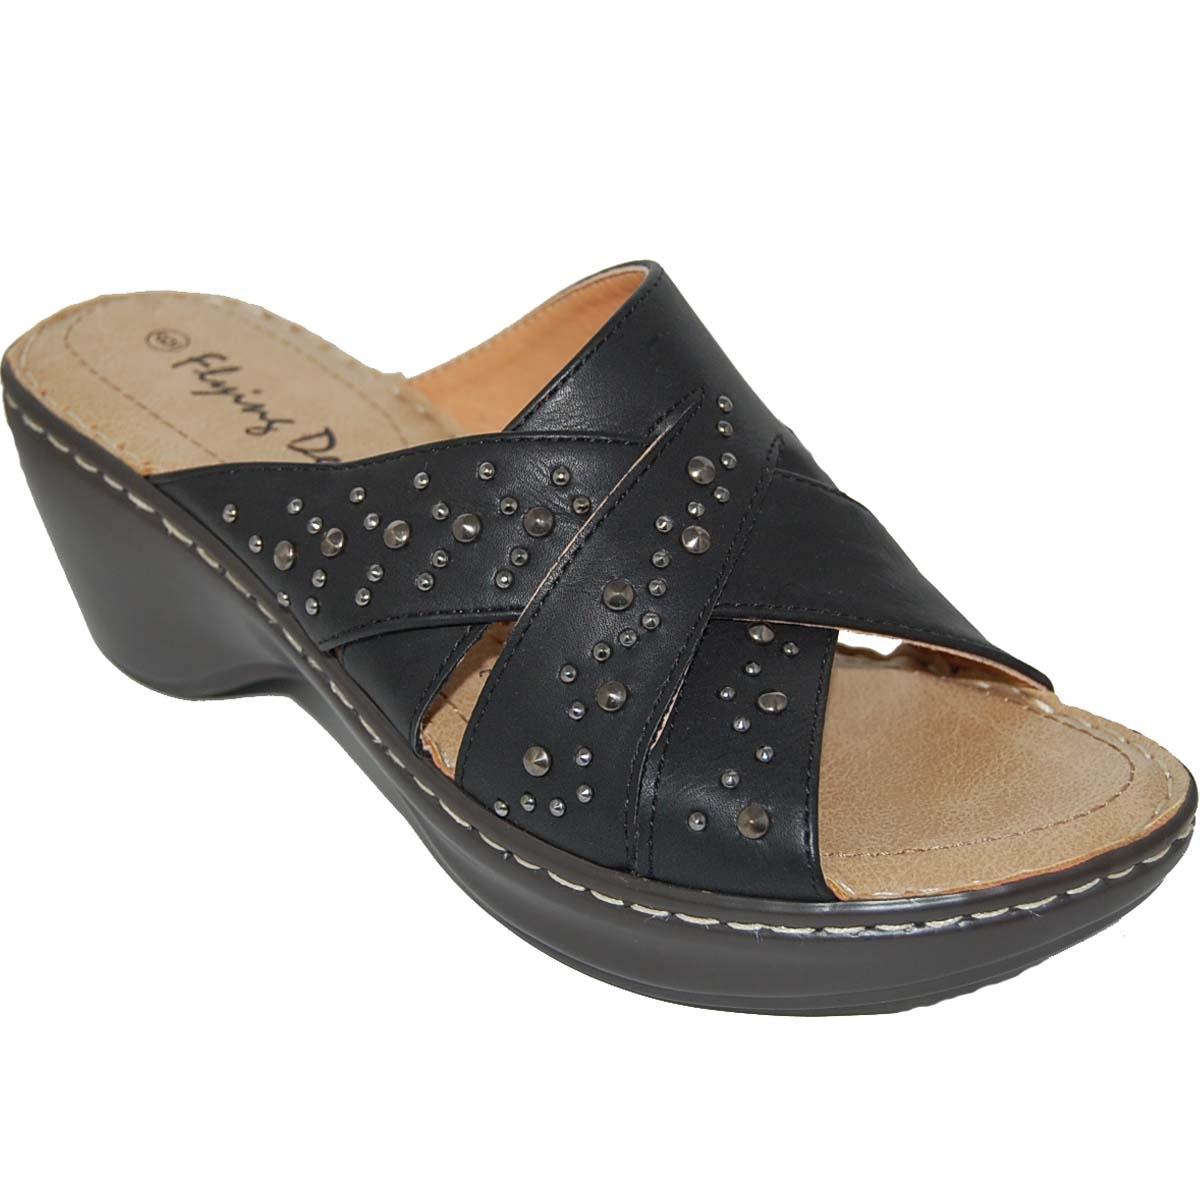 Shoe Factory: DESIGNER SHOE FACTORY HIGH FASHION SLIP-ON SANDALS